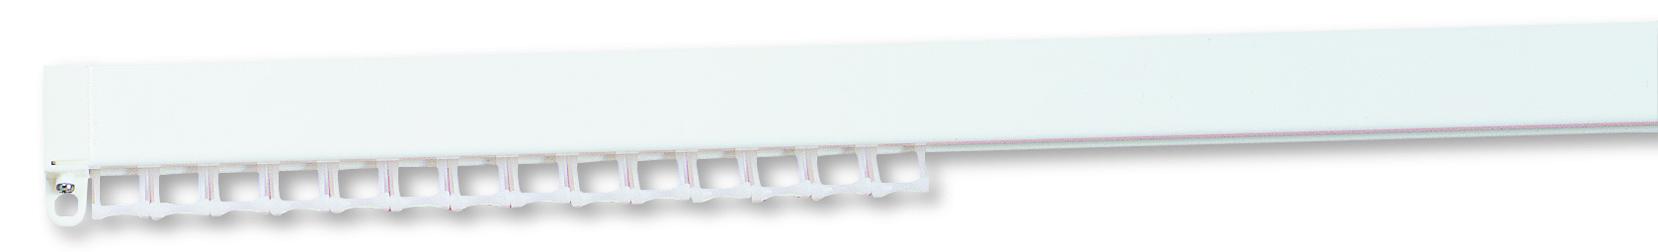 Silent Gliss System 1280 White Aluminium Curtain Track